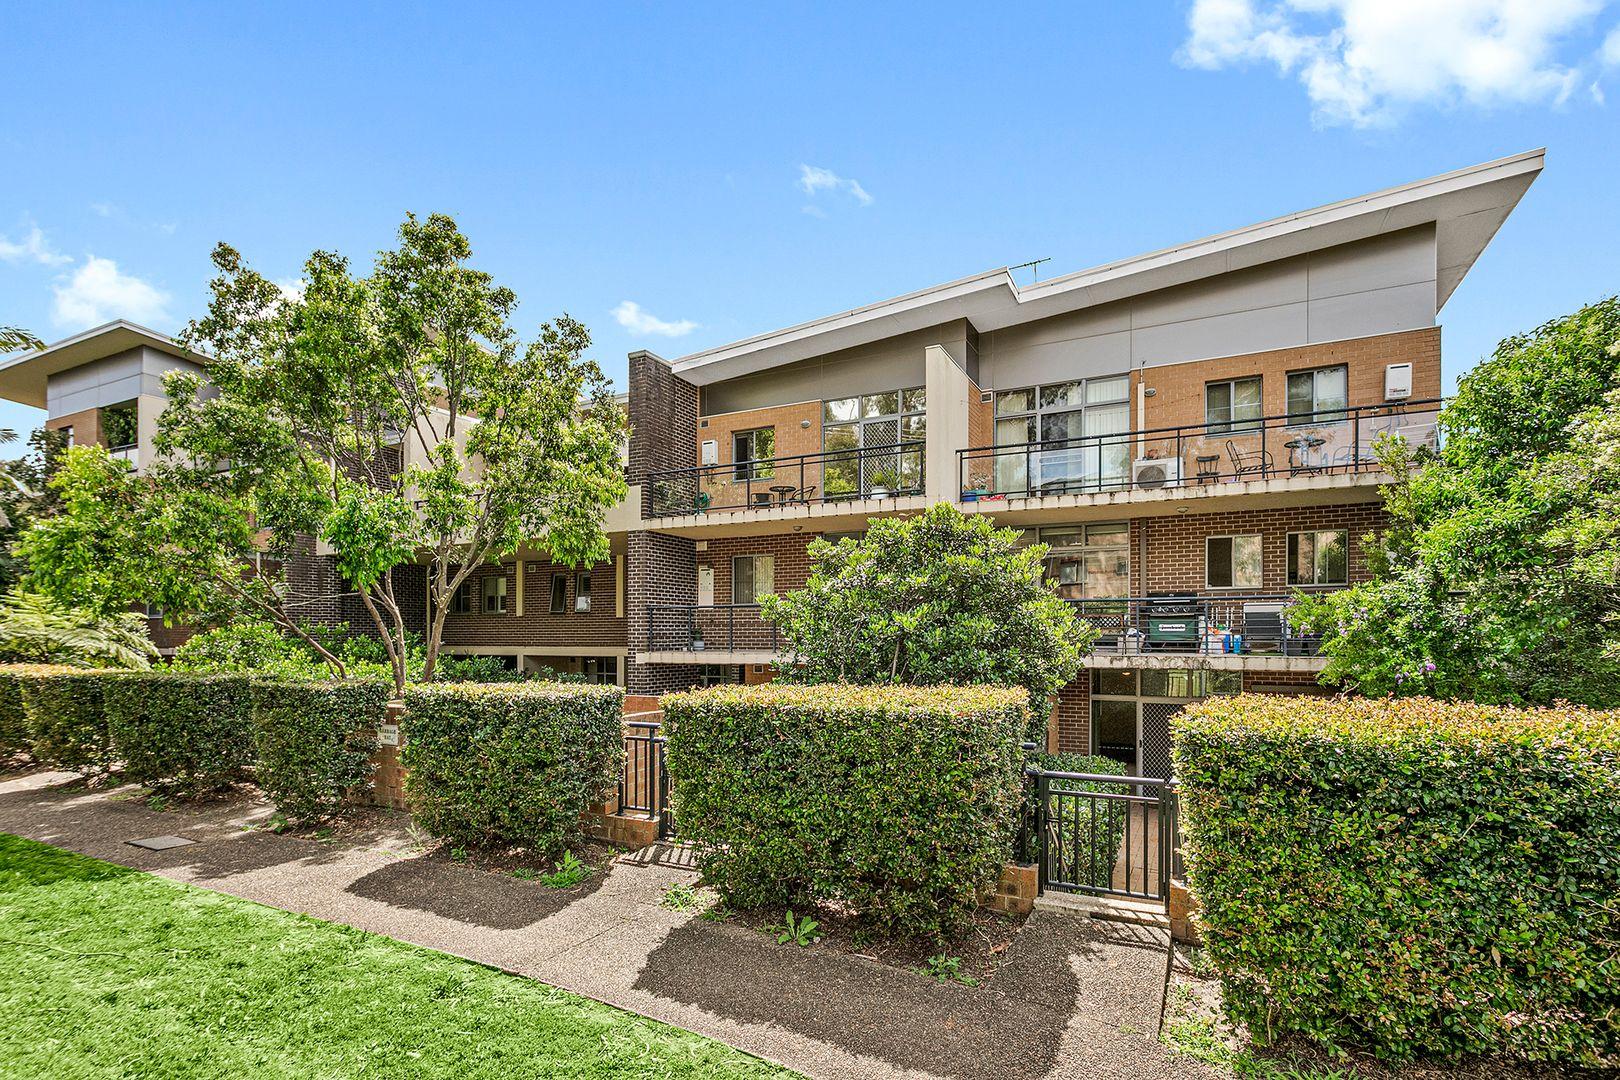 14/58 Belmont Street, Sutherland NSW 2232, Image 0